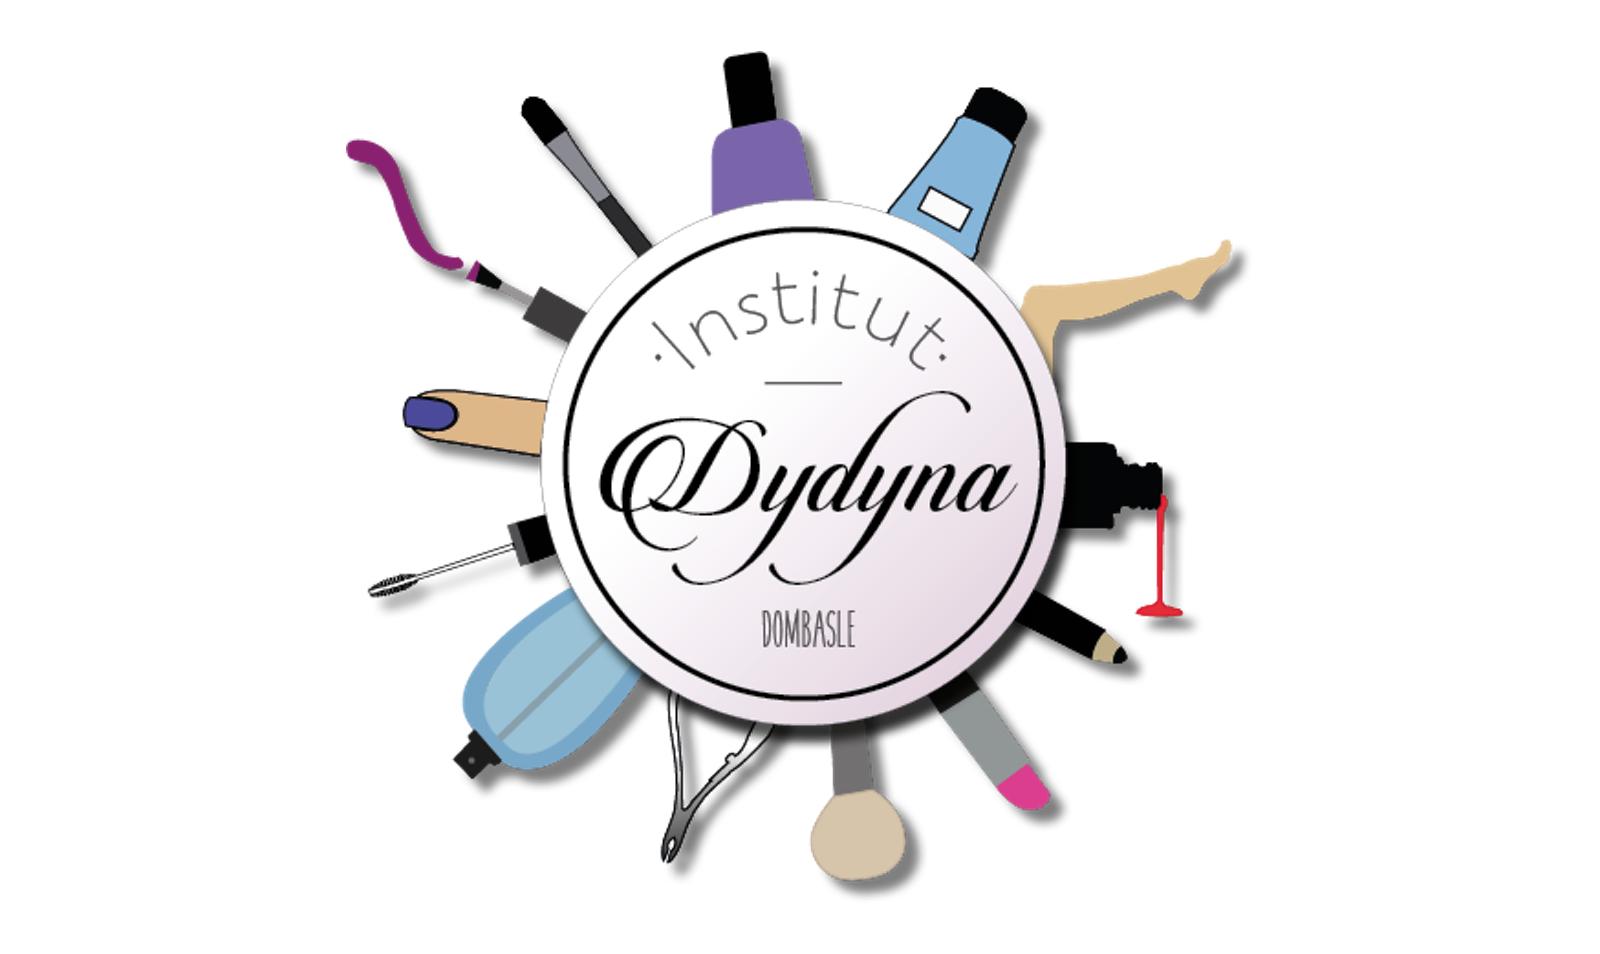 Institut Dydyna